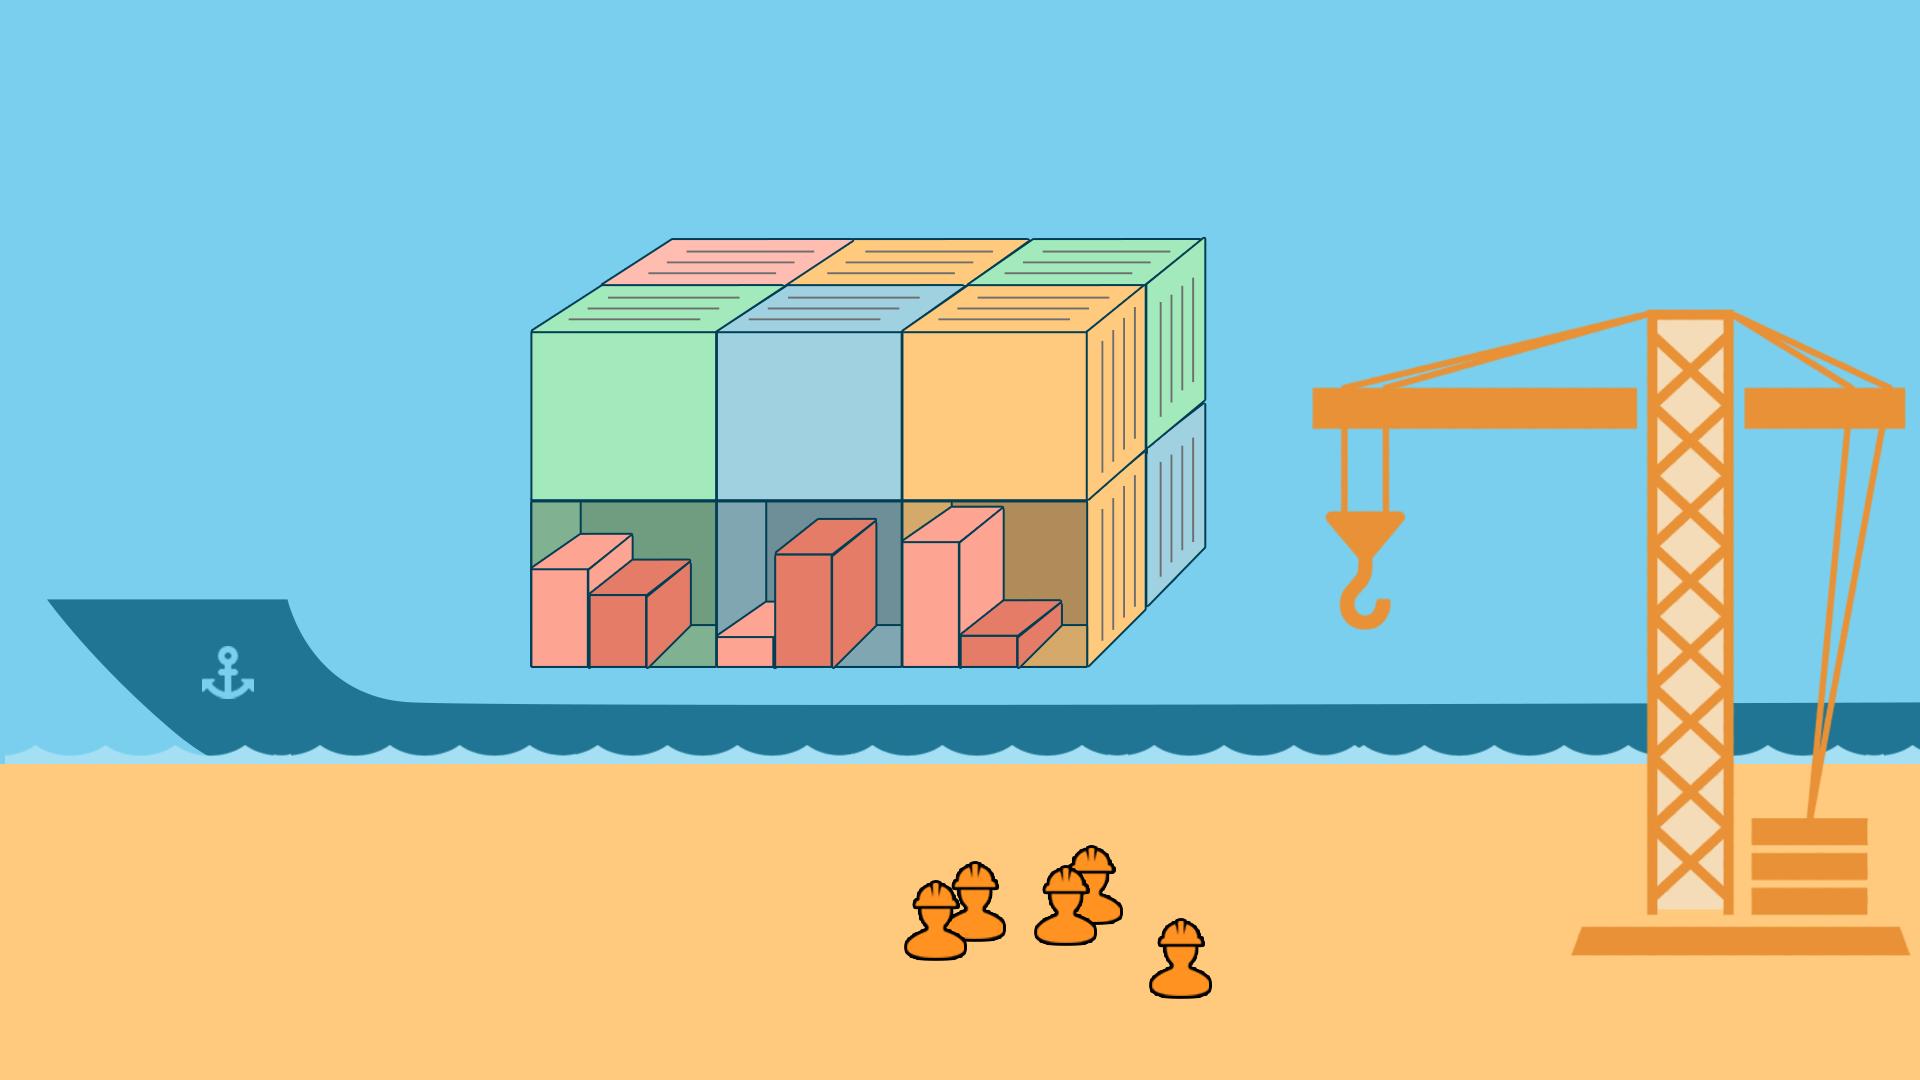 Wharf Wharf 0.3.1 发布 ContainerOps 平台